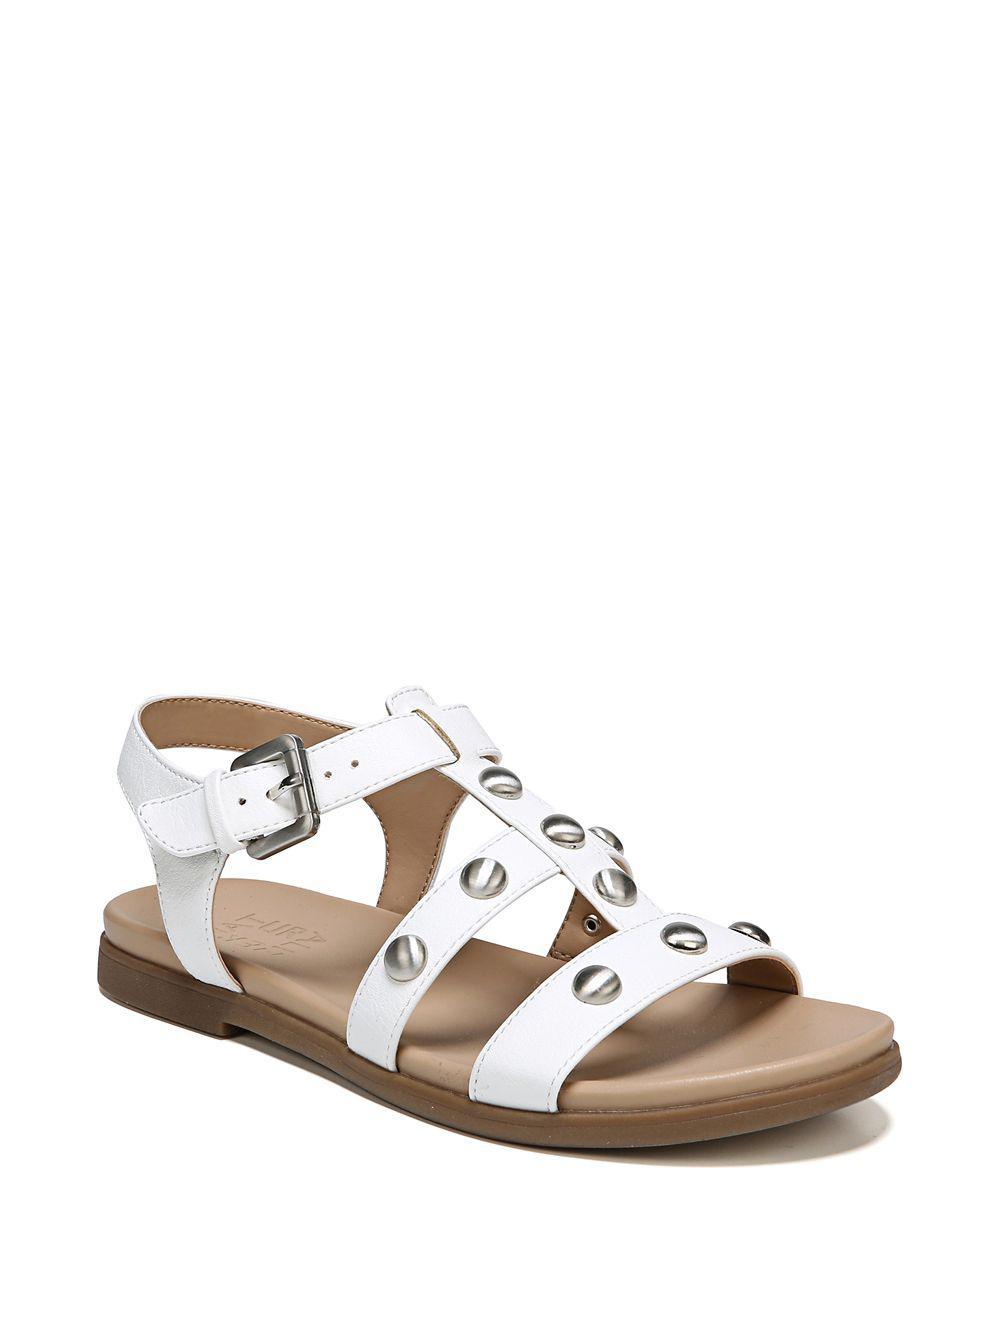 e62b6ba04b50 Naturalizer Davi Slingback Sandals in White - Lyst